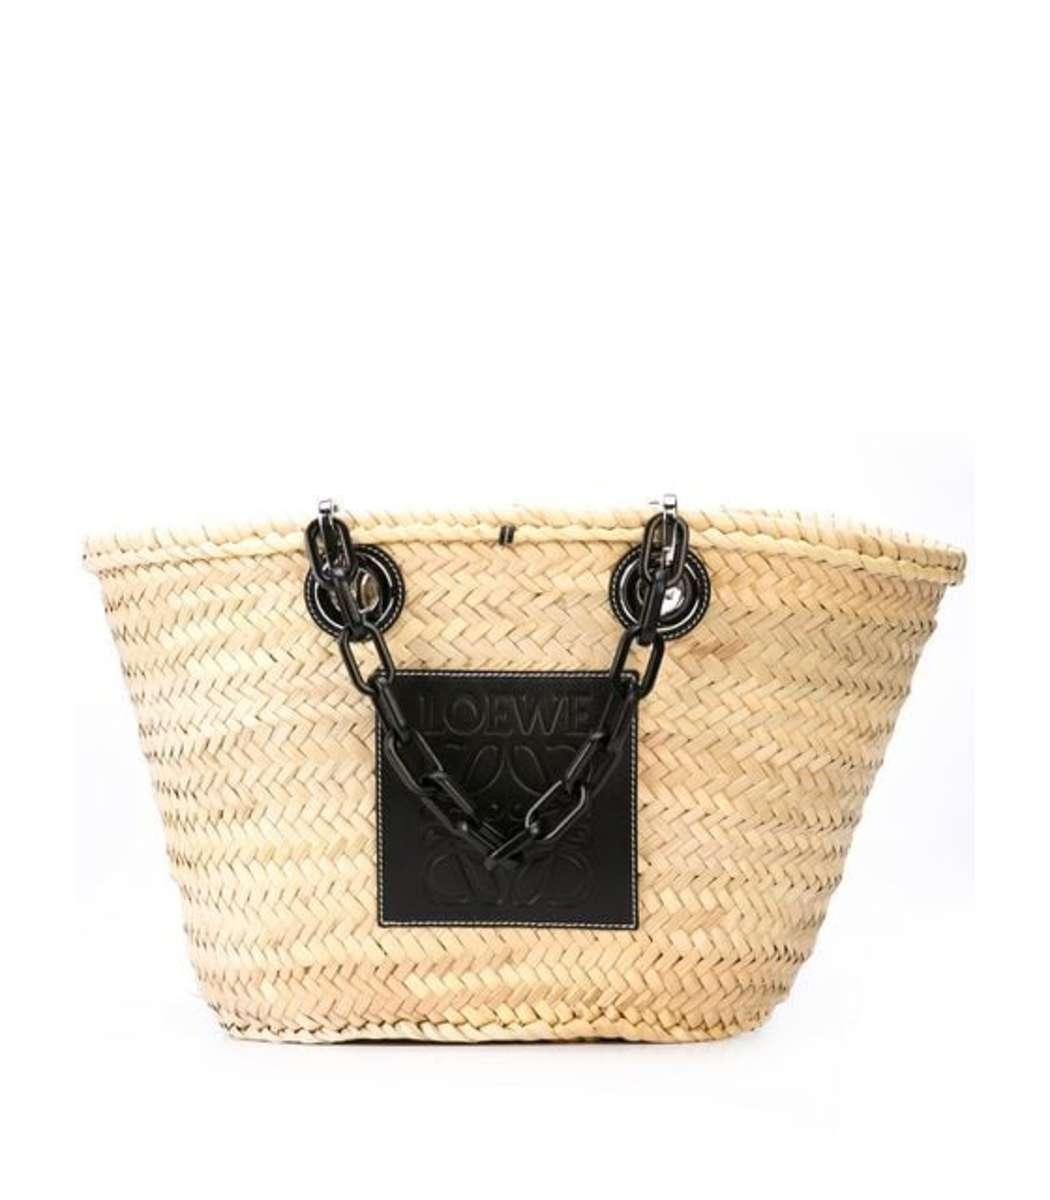 Loewe Totes Basket Chain Handle Tote Bag